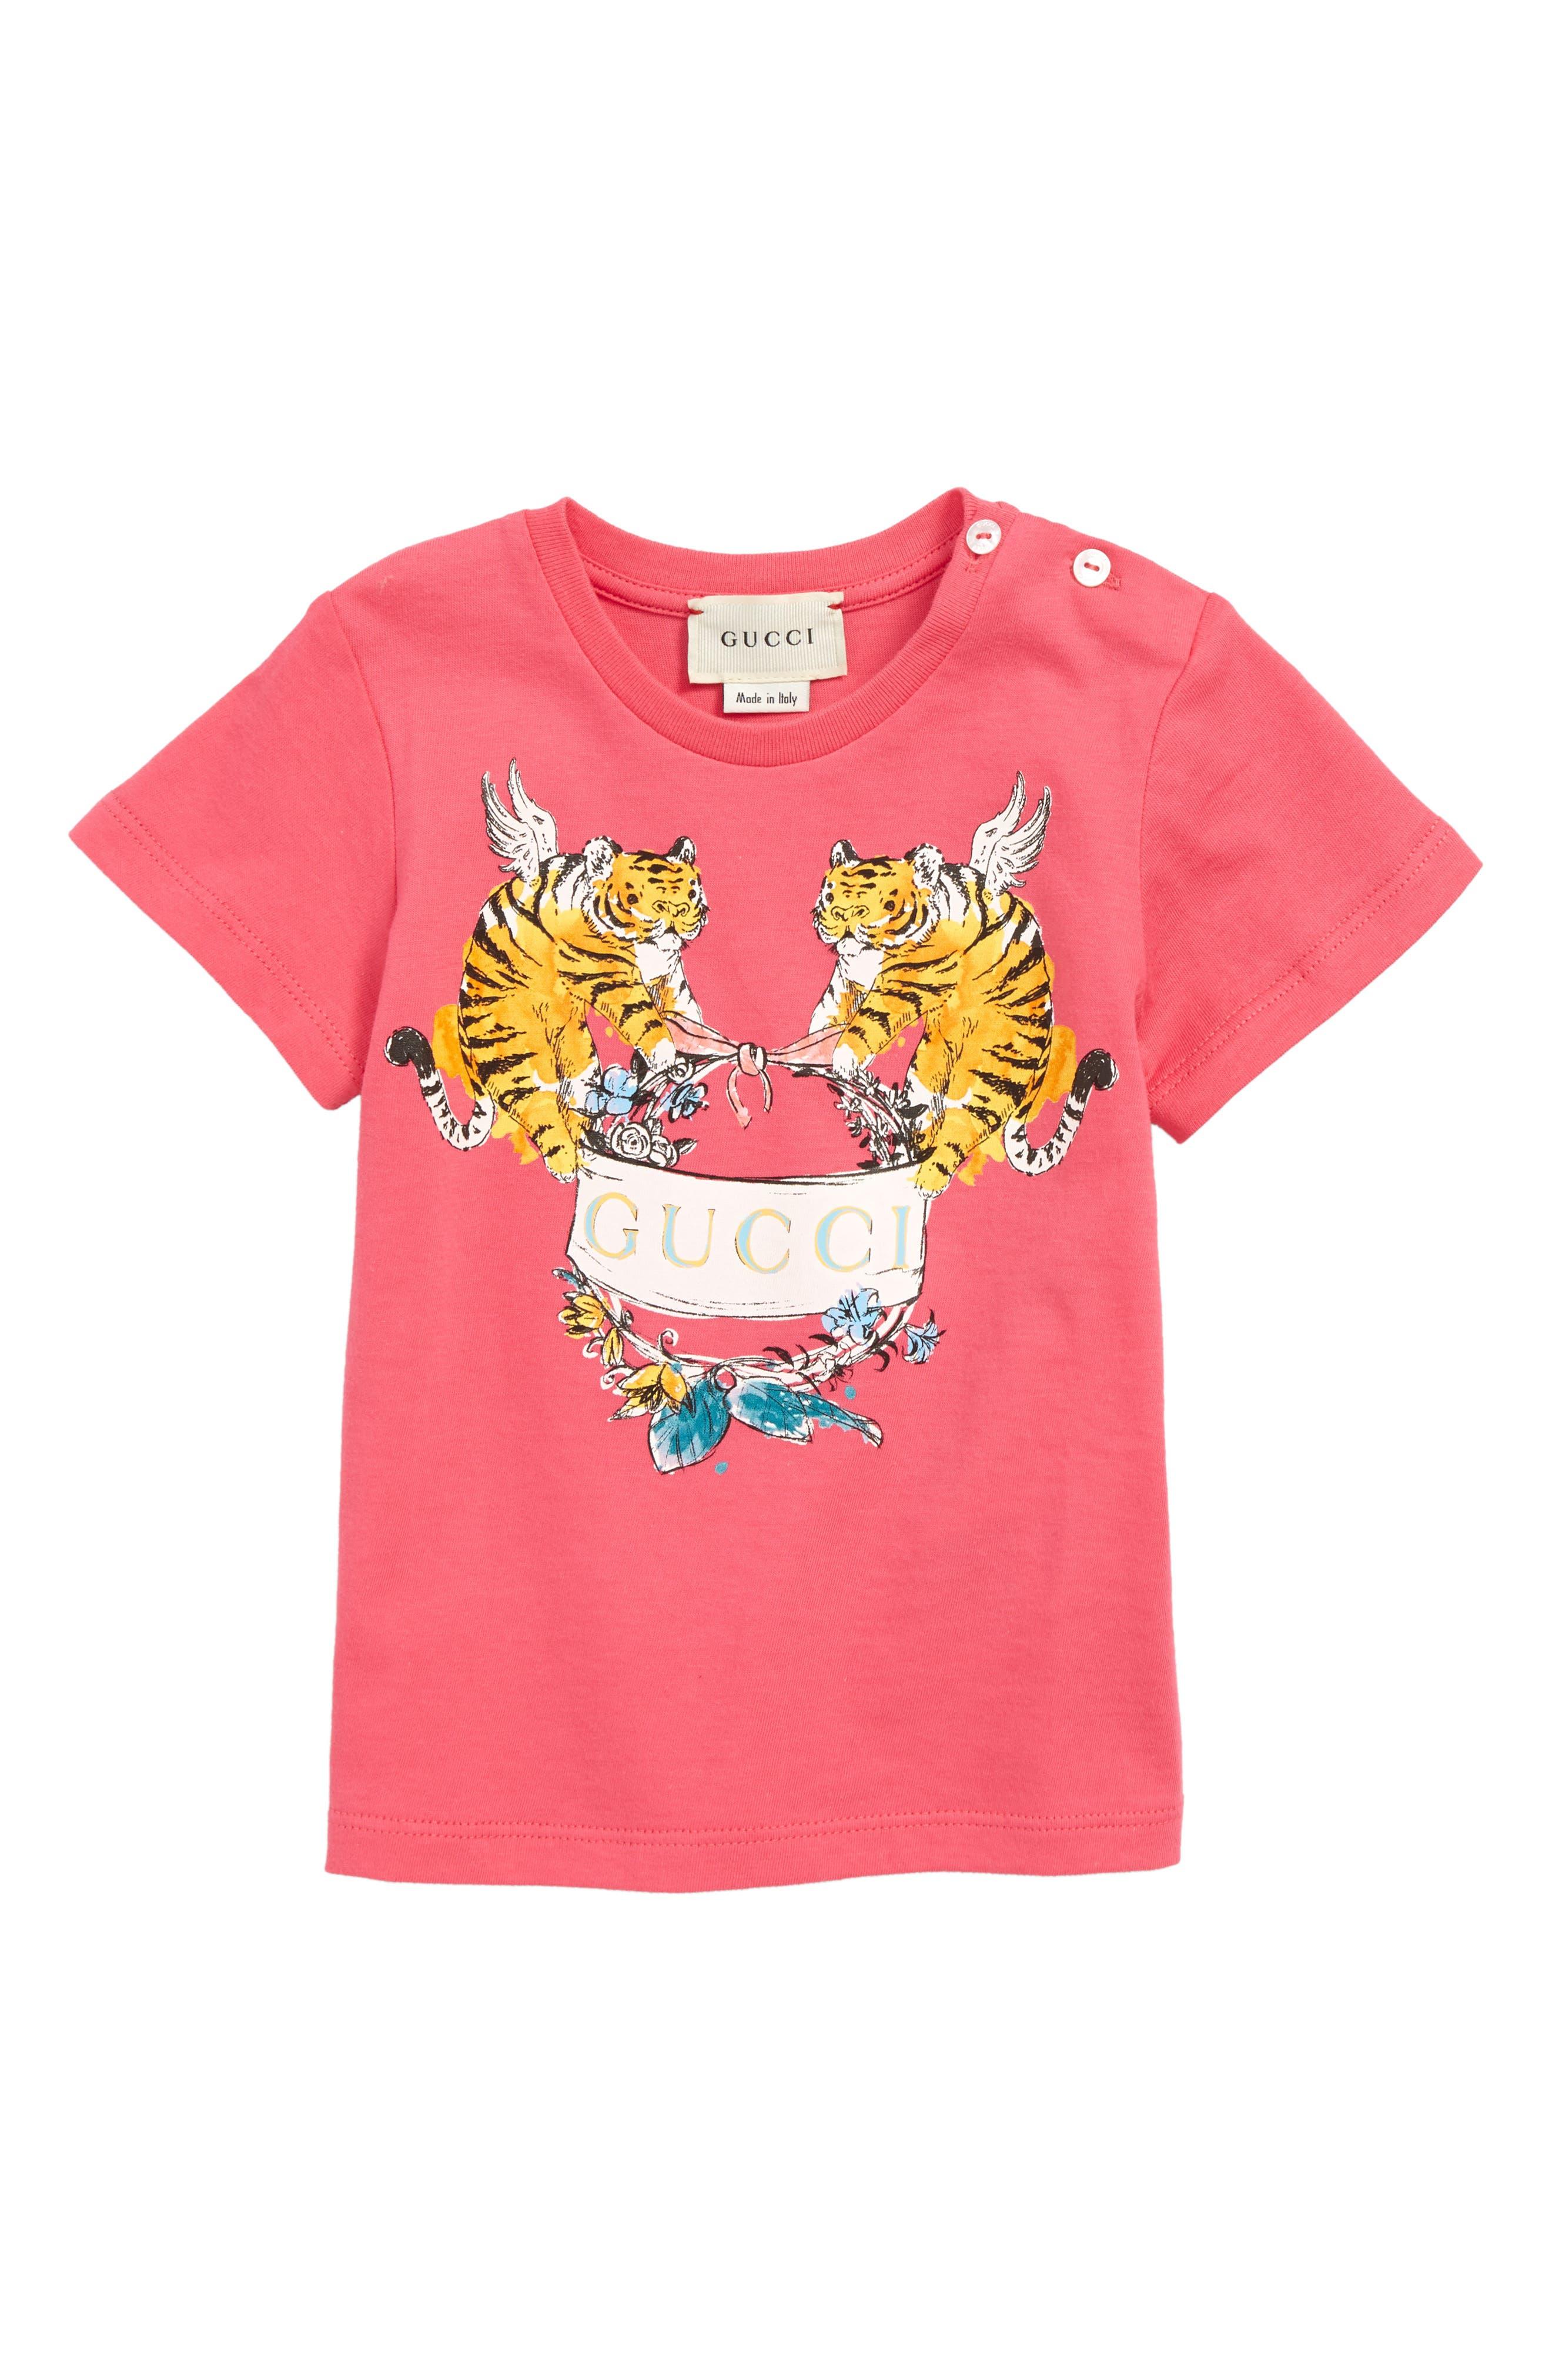 GUCCI Graphic T-Shirt, Main, color, BABA